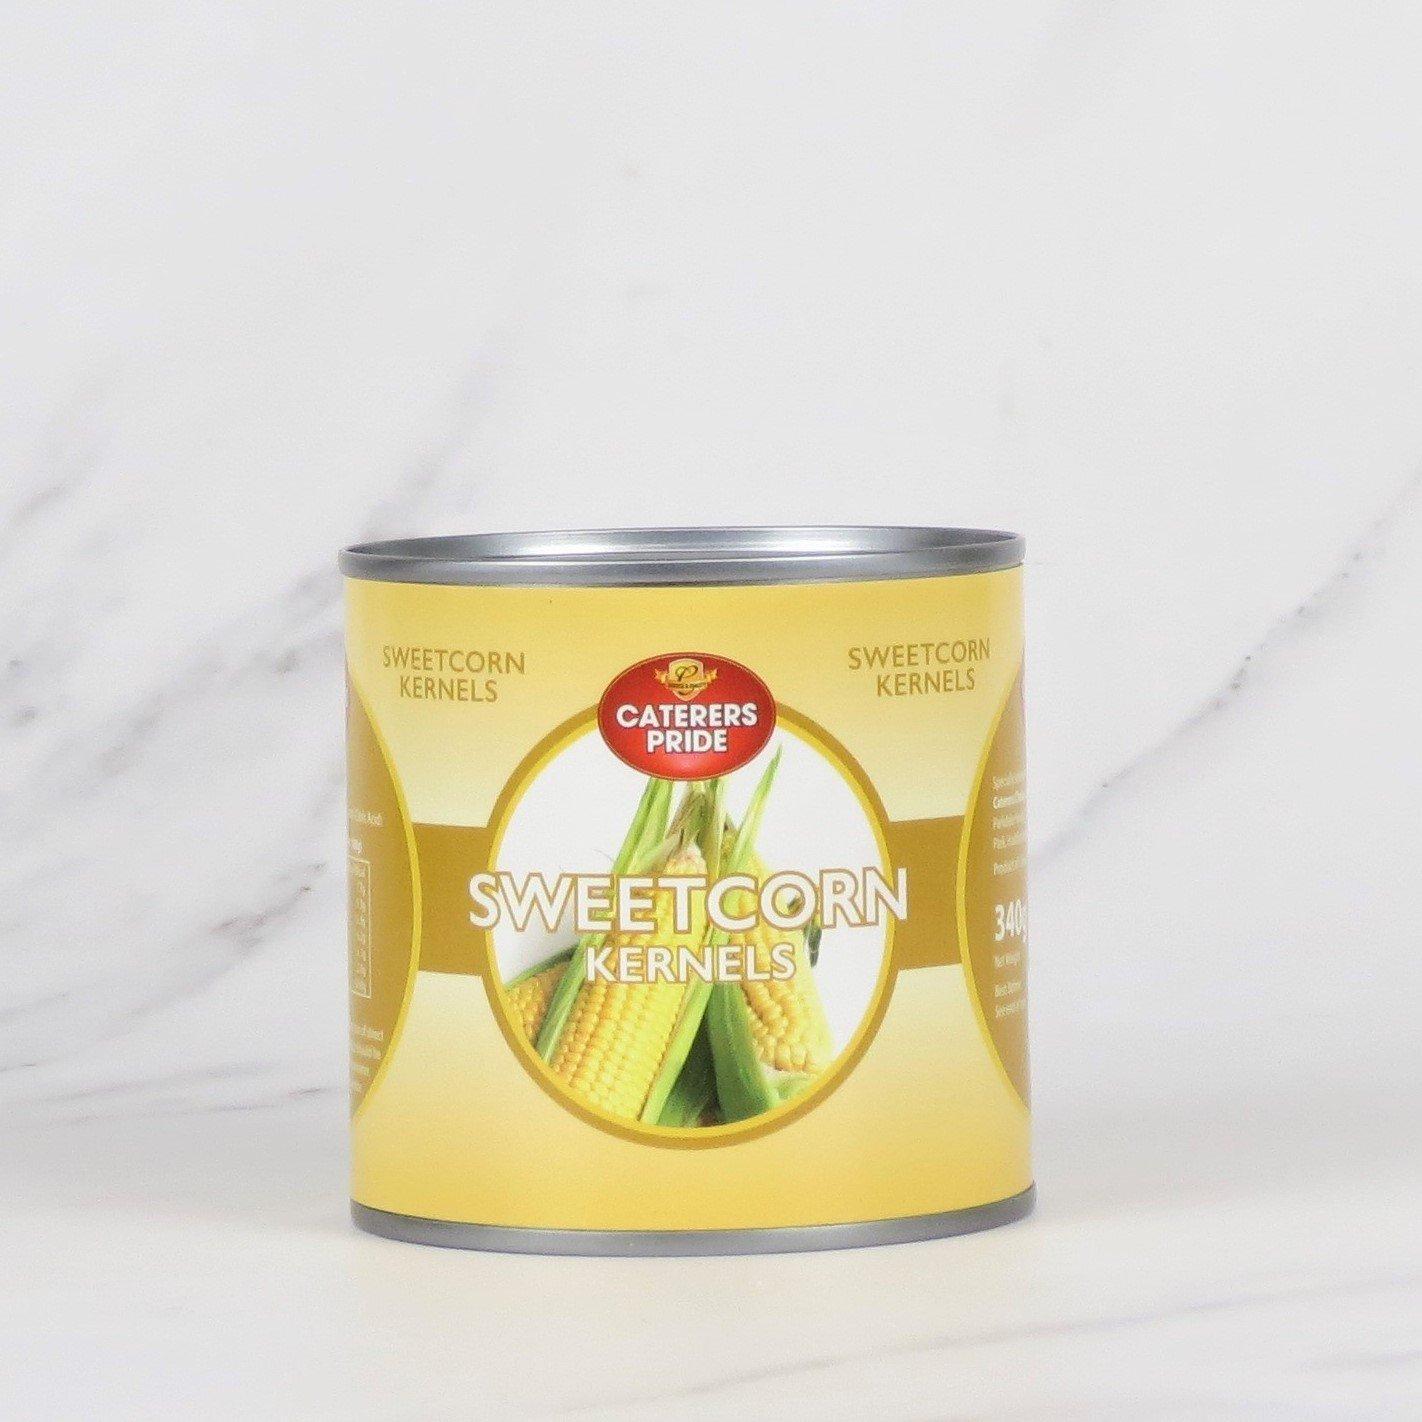 Sweetcorn Kernels – 12 x 340g